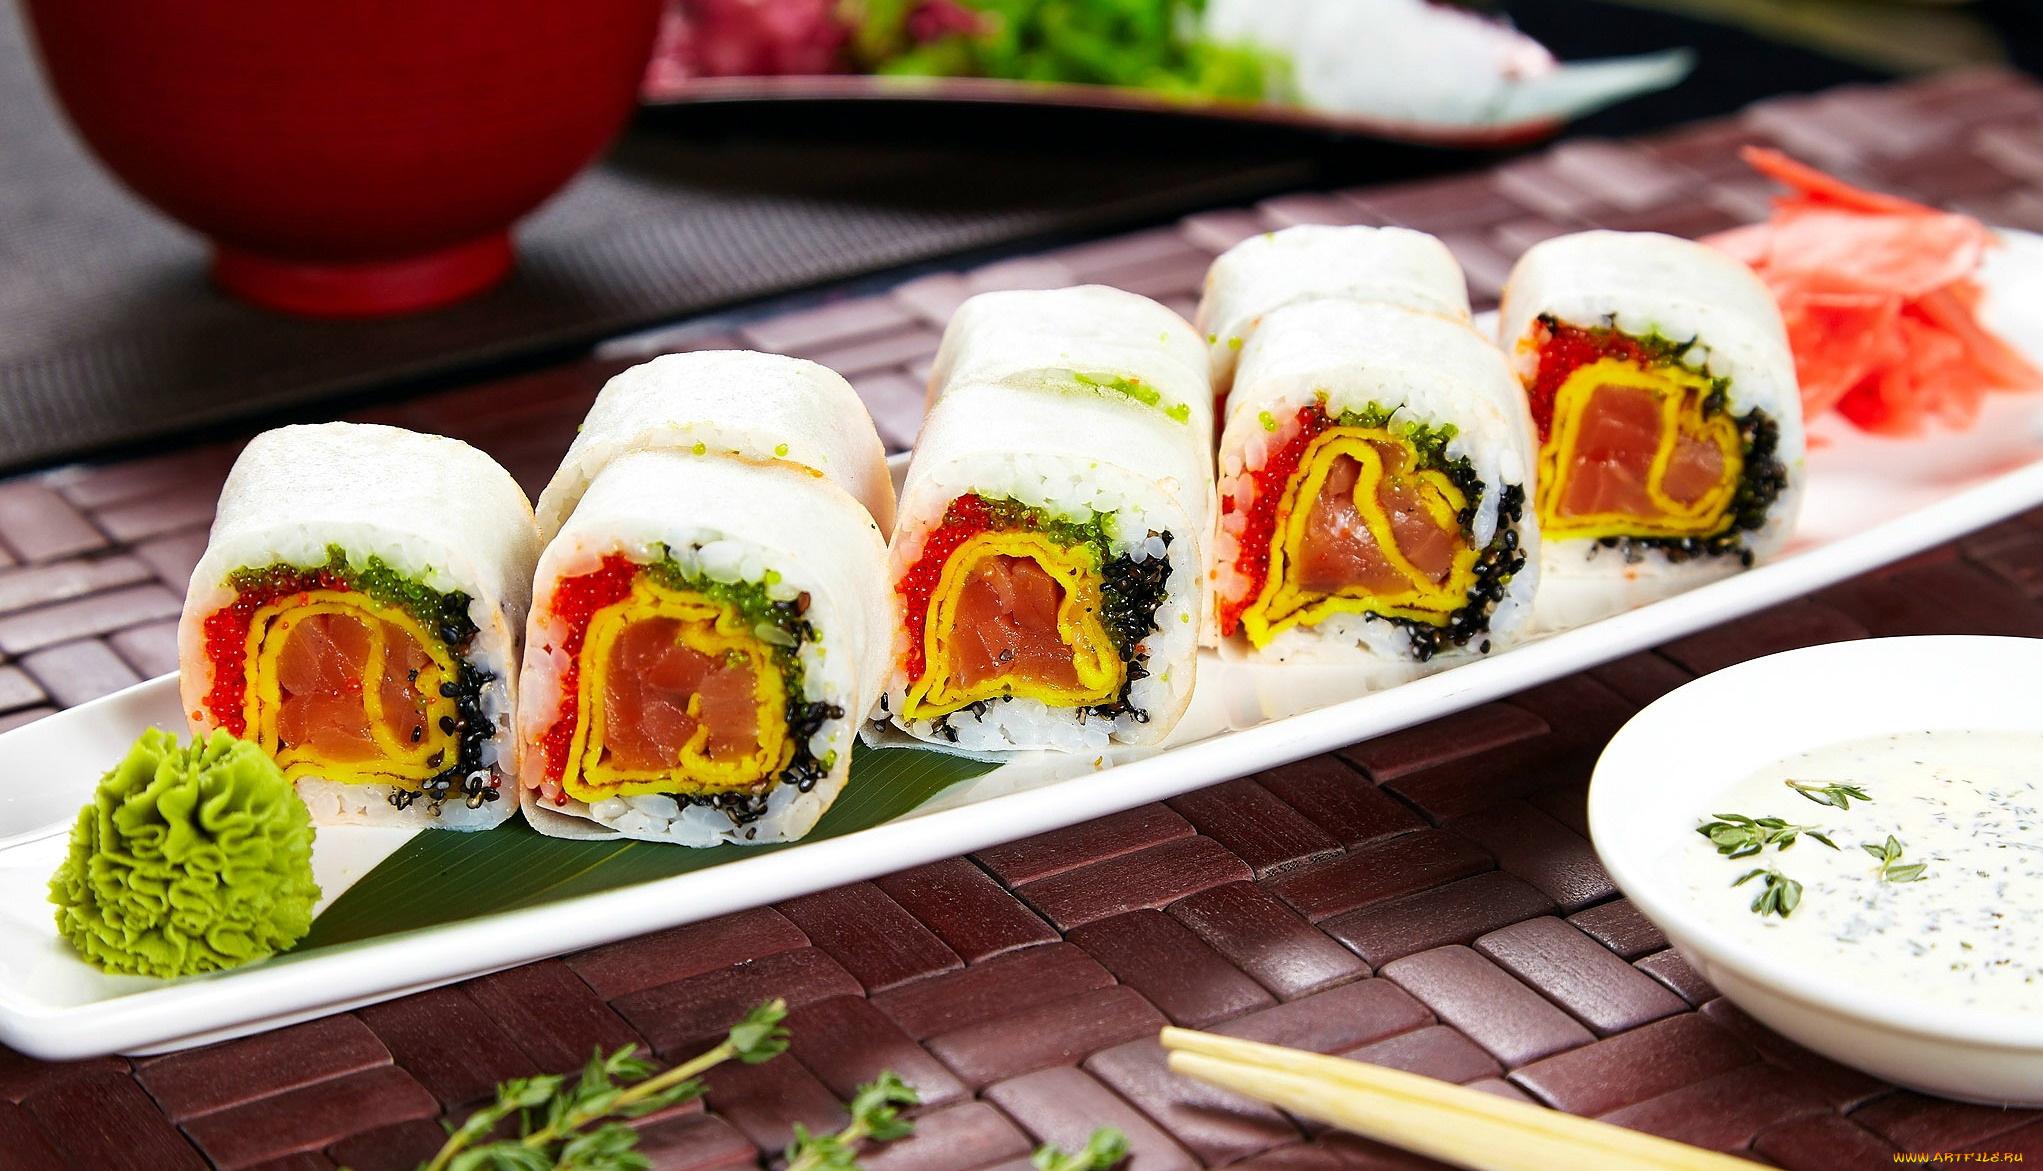 еда роллы васаби имбирь food rolls wasabi ginger бесплатно